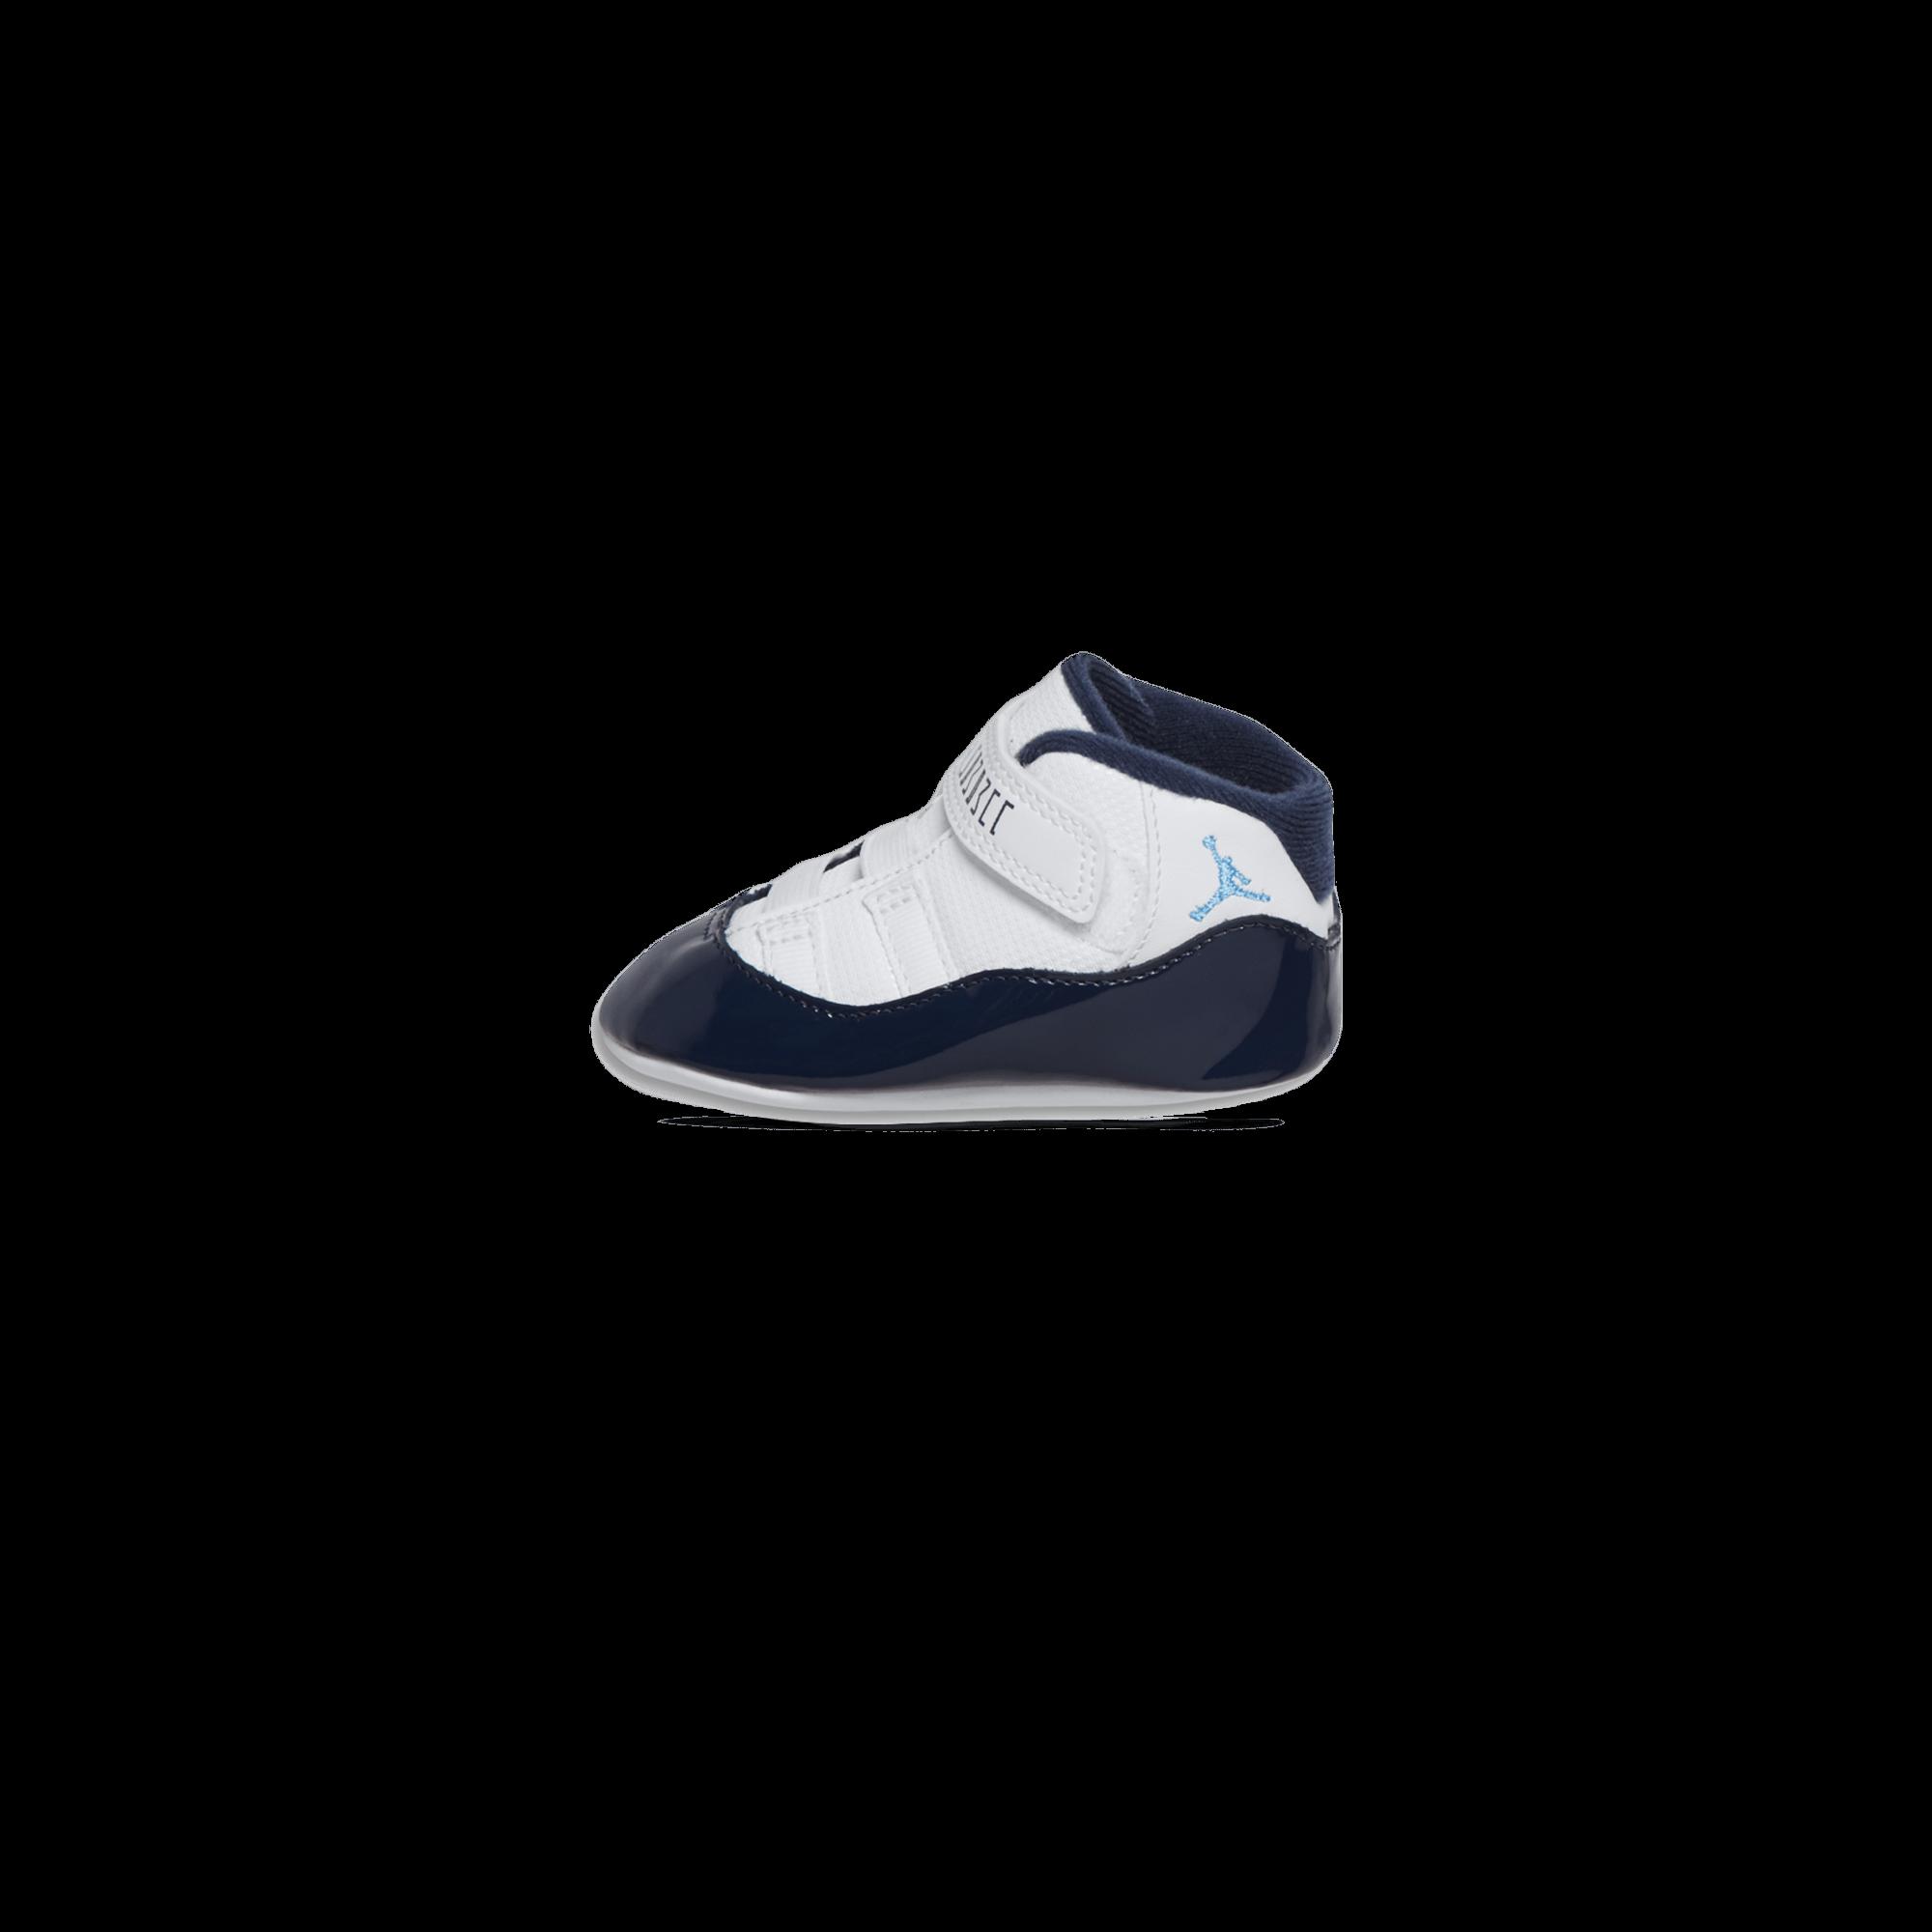 30fb1e47f4b5 ... Win Like 96 Red Infant Shoes 378049-623 Nike Air Jordan 13 Retro Infant  Gift Pack - Brave Blue Black University Blue 11 Retro Infant Gift Pack ...